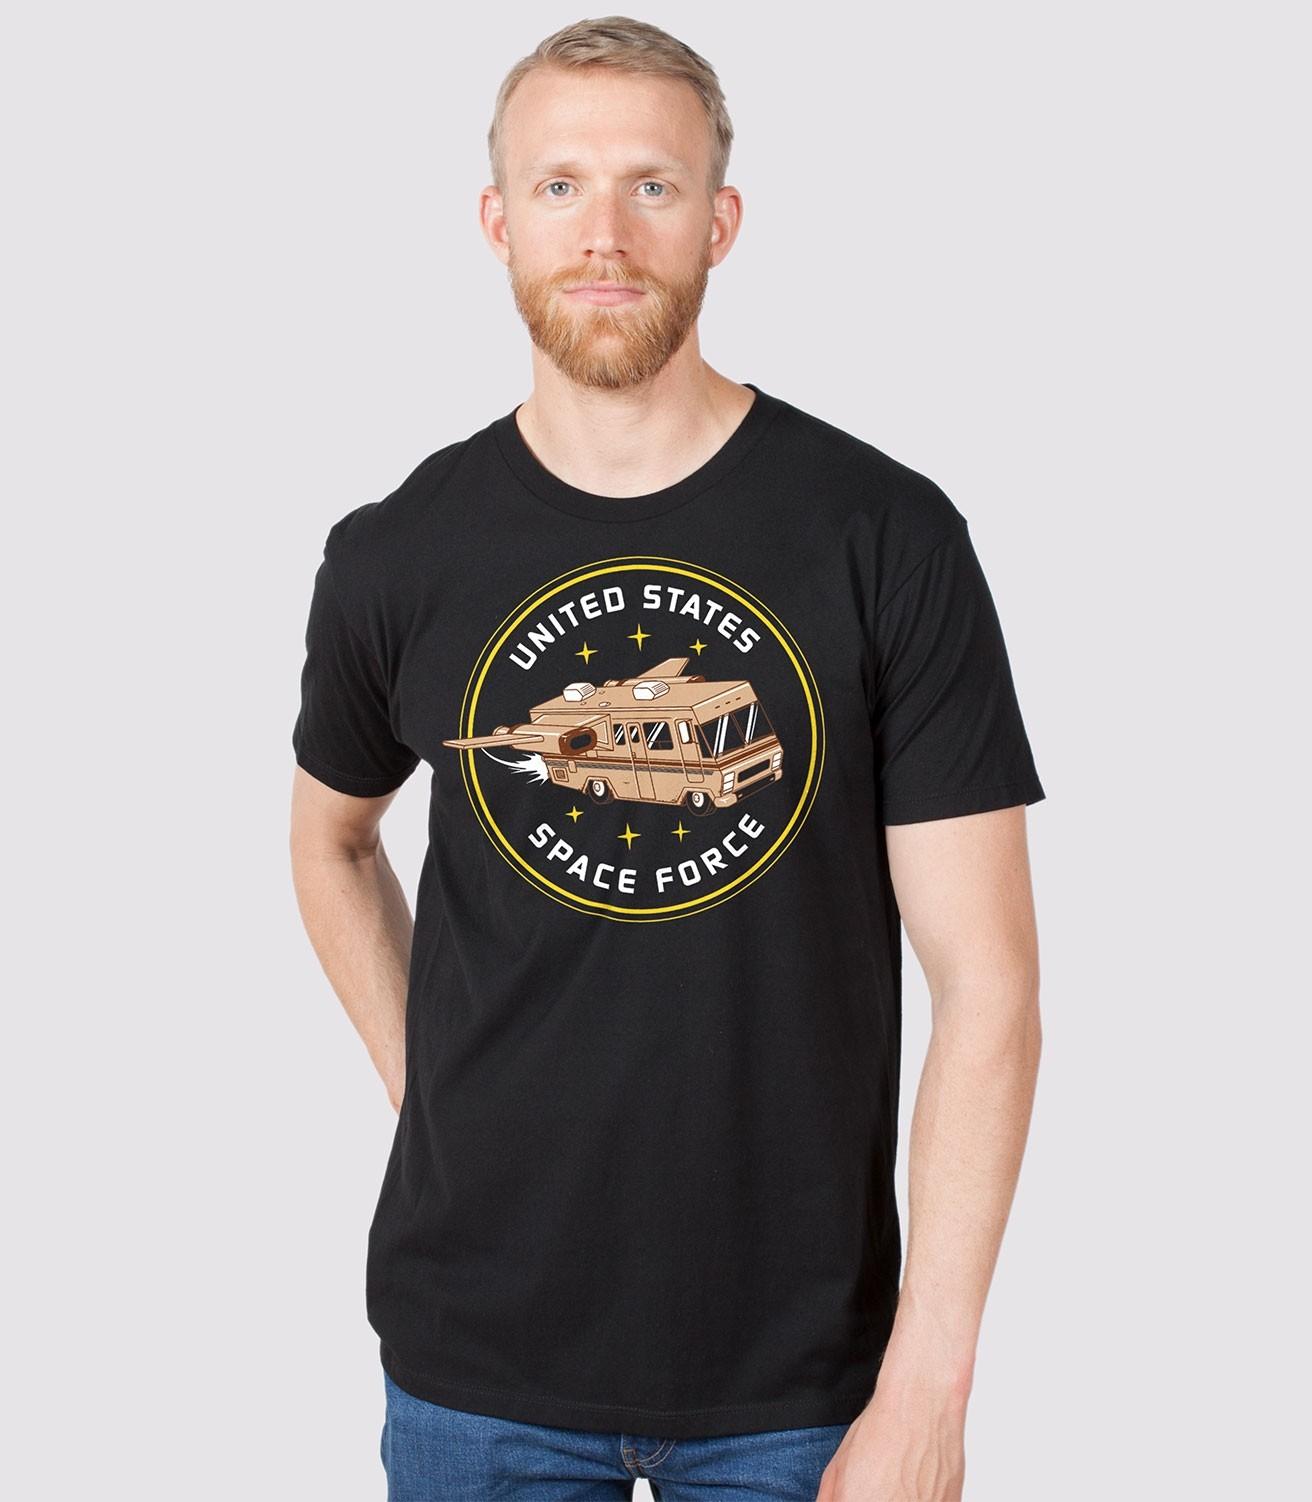 becb9adf6b Space Force Funny Men's 100% Cotton T-Shirt | Headline Shirts